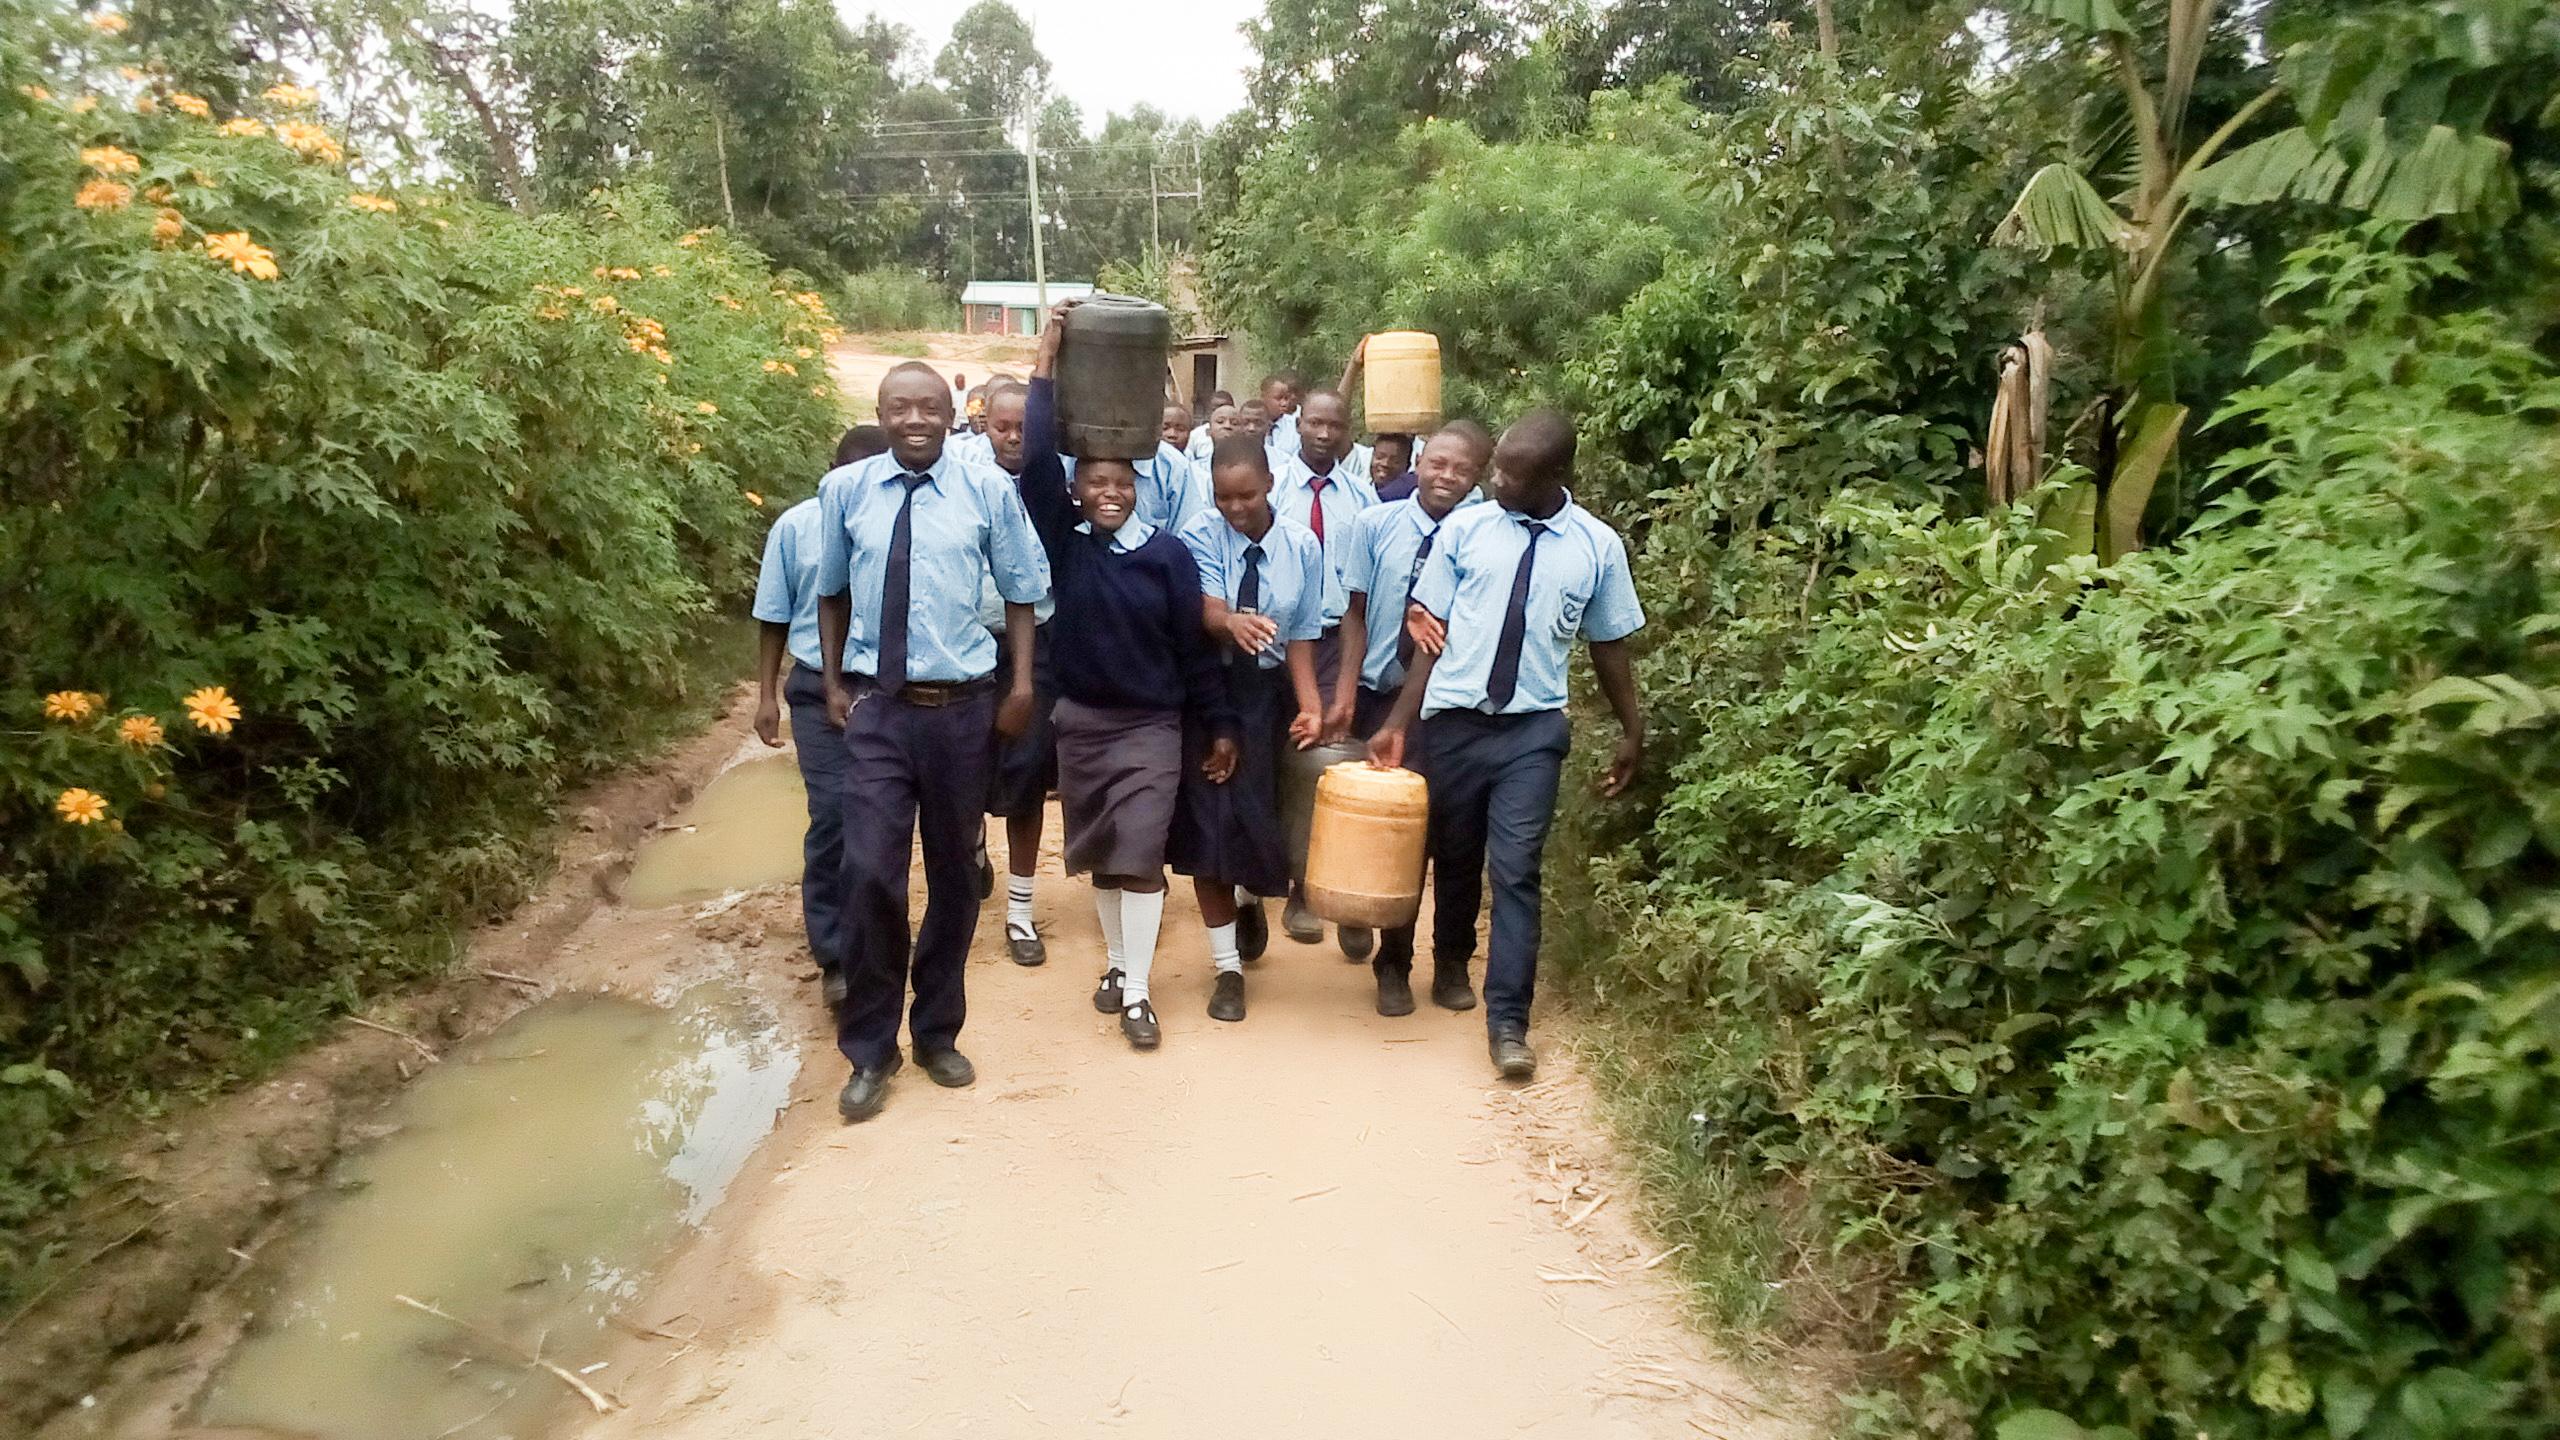 The Water Project : 10-kenya19012-walking-back-to-school